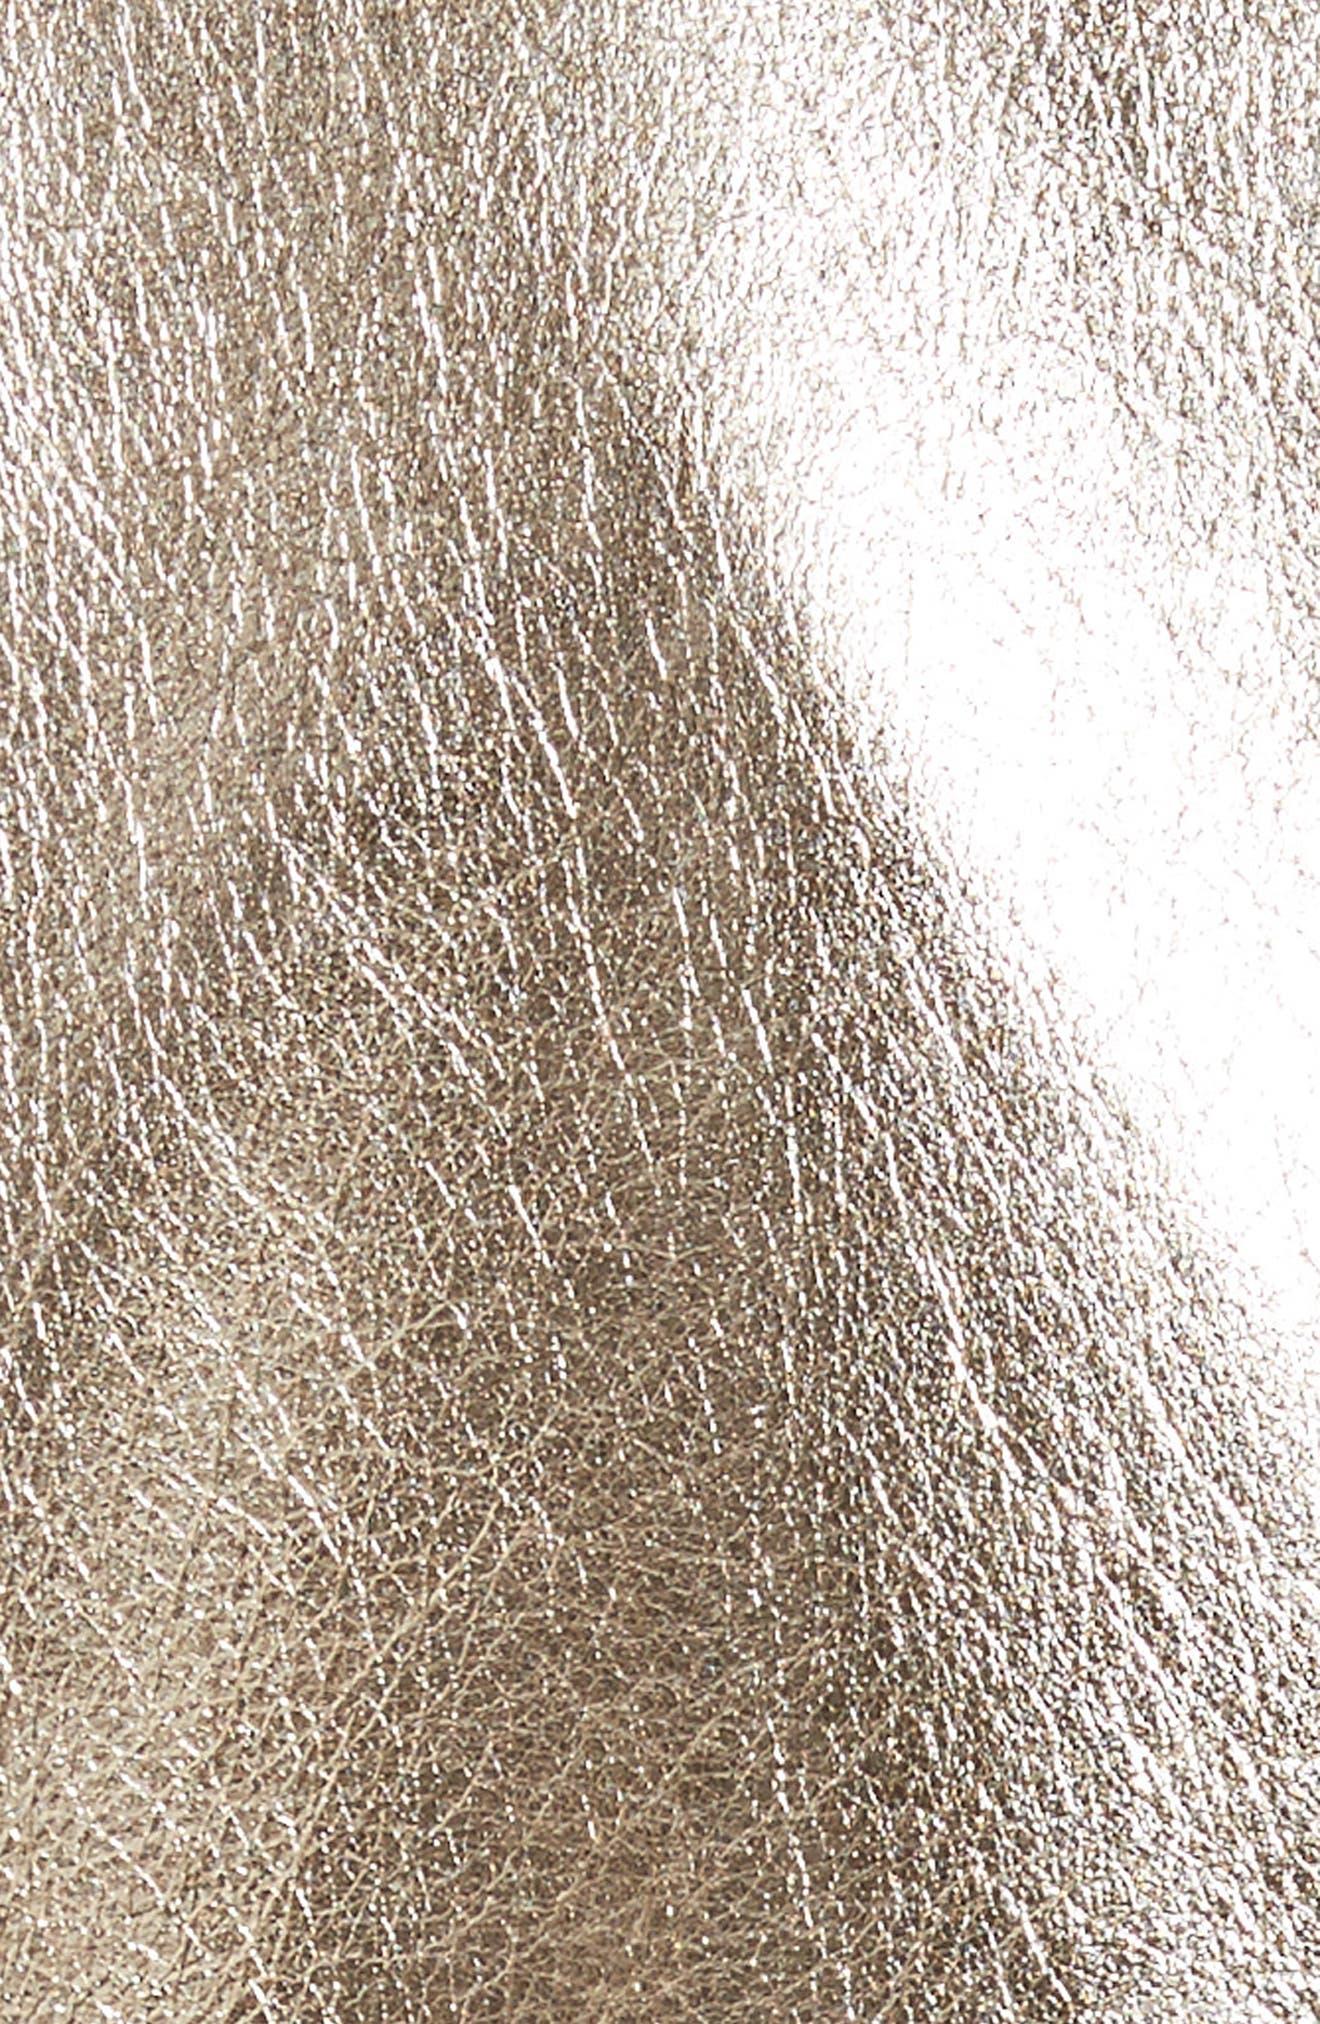 Foiled Metallic Leather Moto Jacket,                             Alternate thumbnail 6, color,